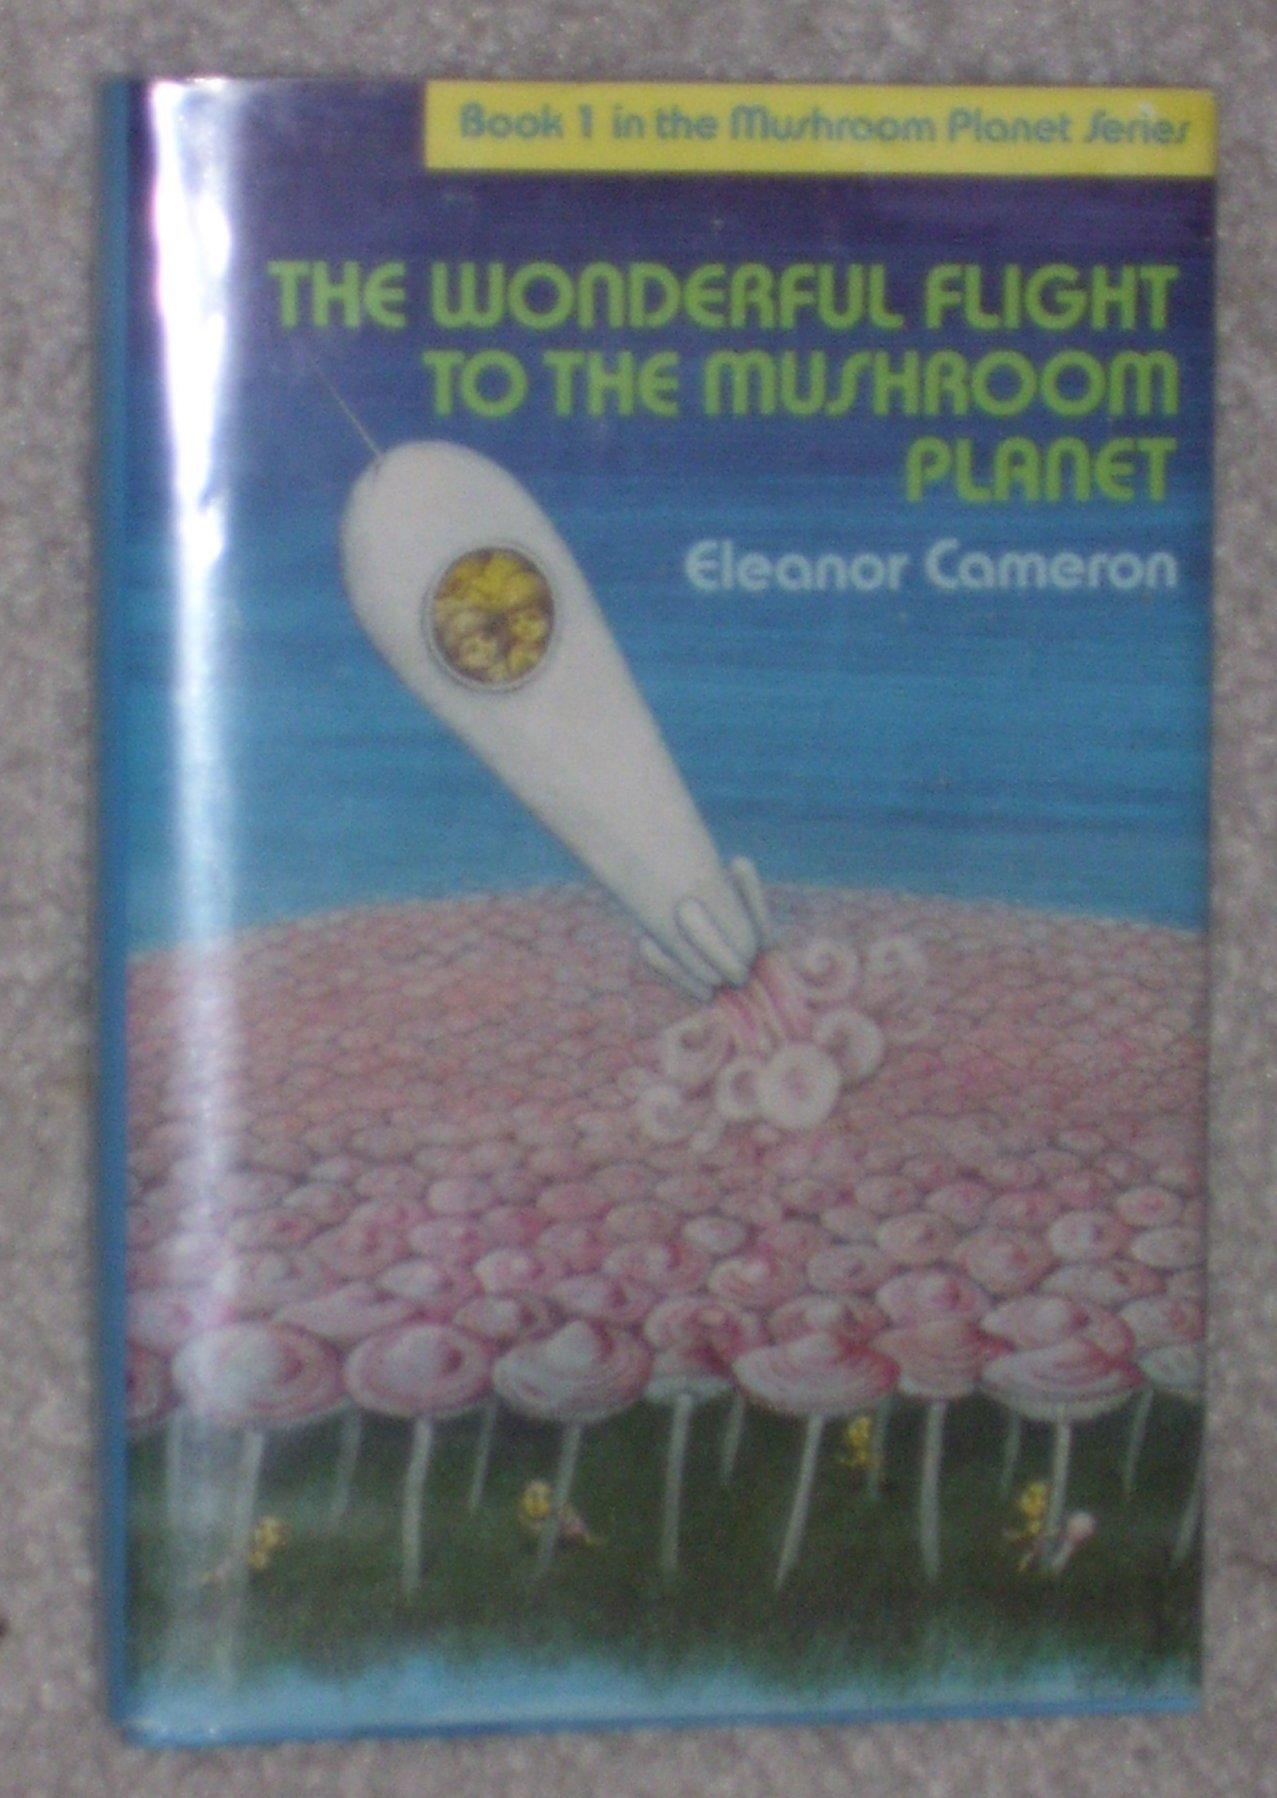 The Wonderful Flight to the Mushroom Planet